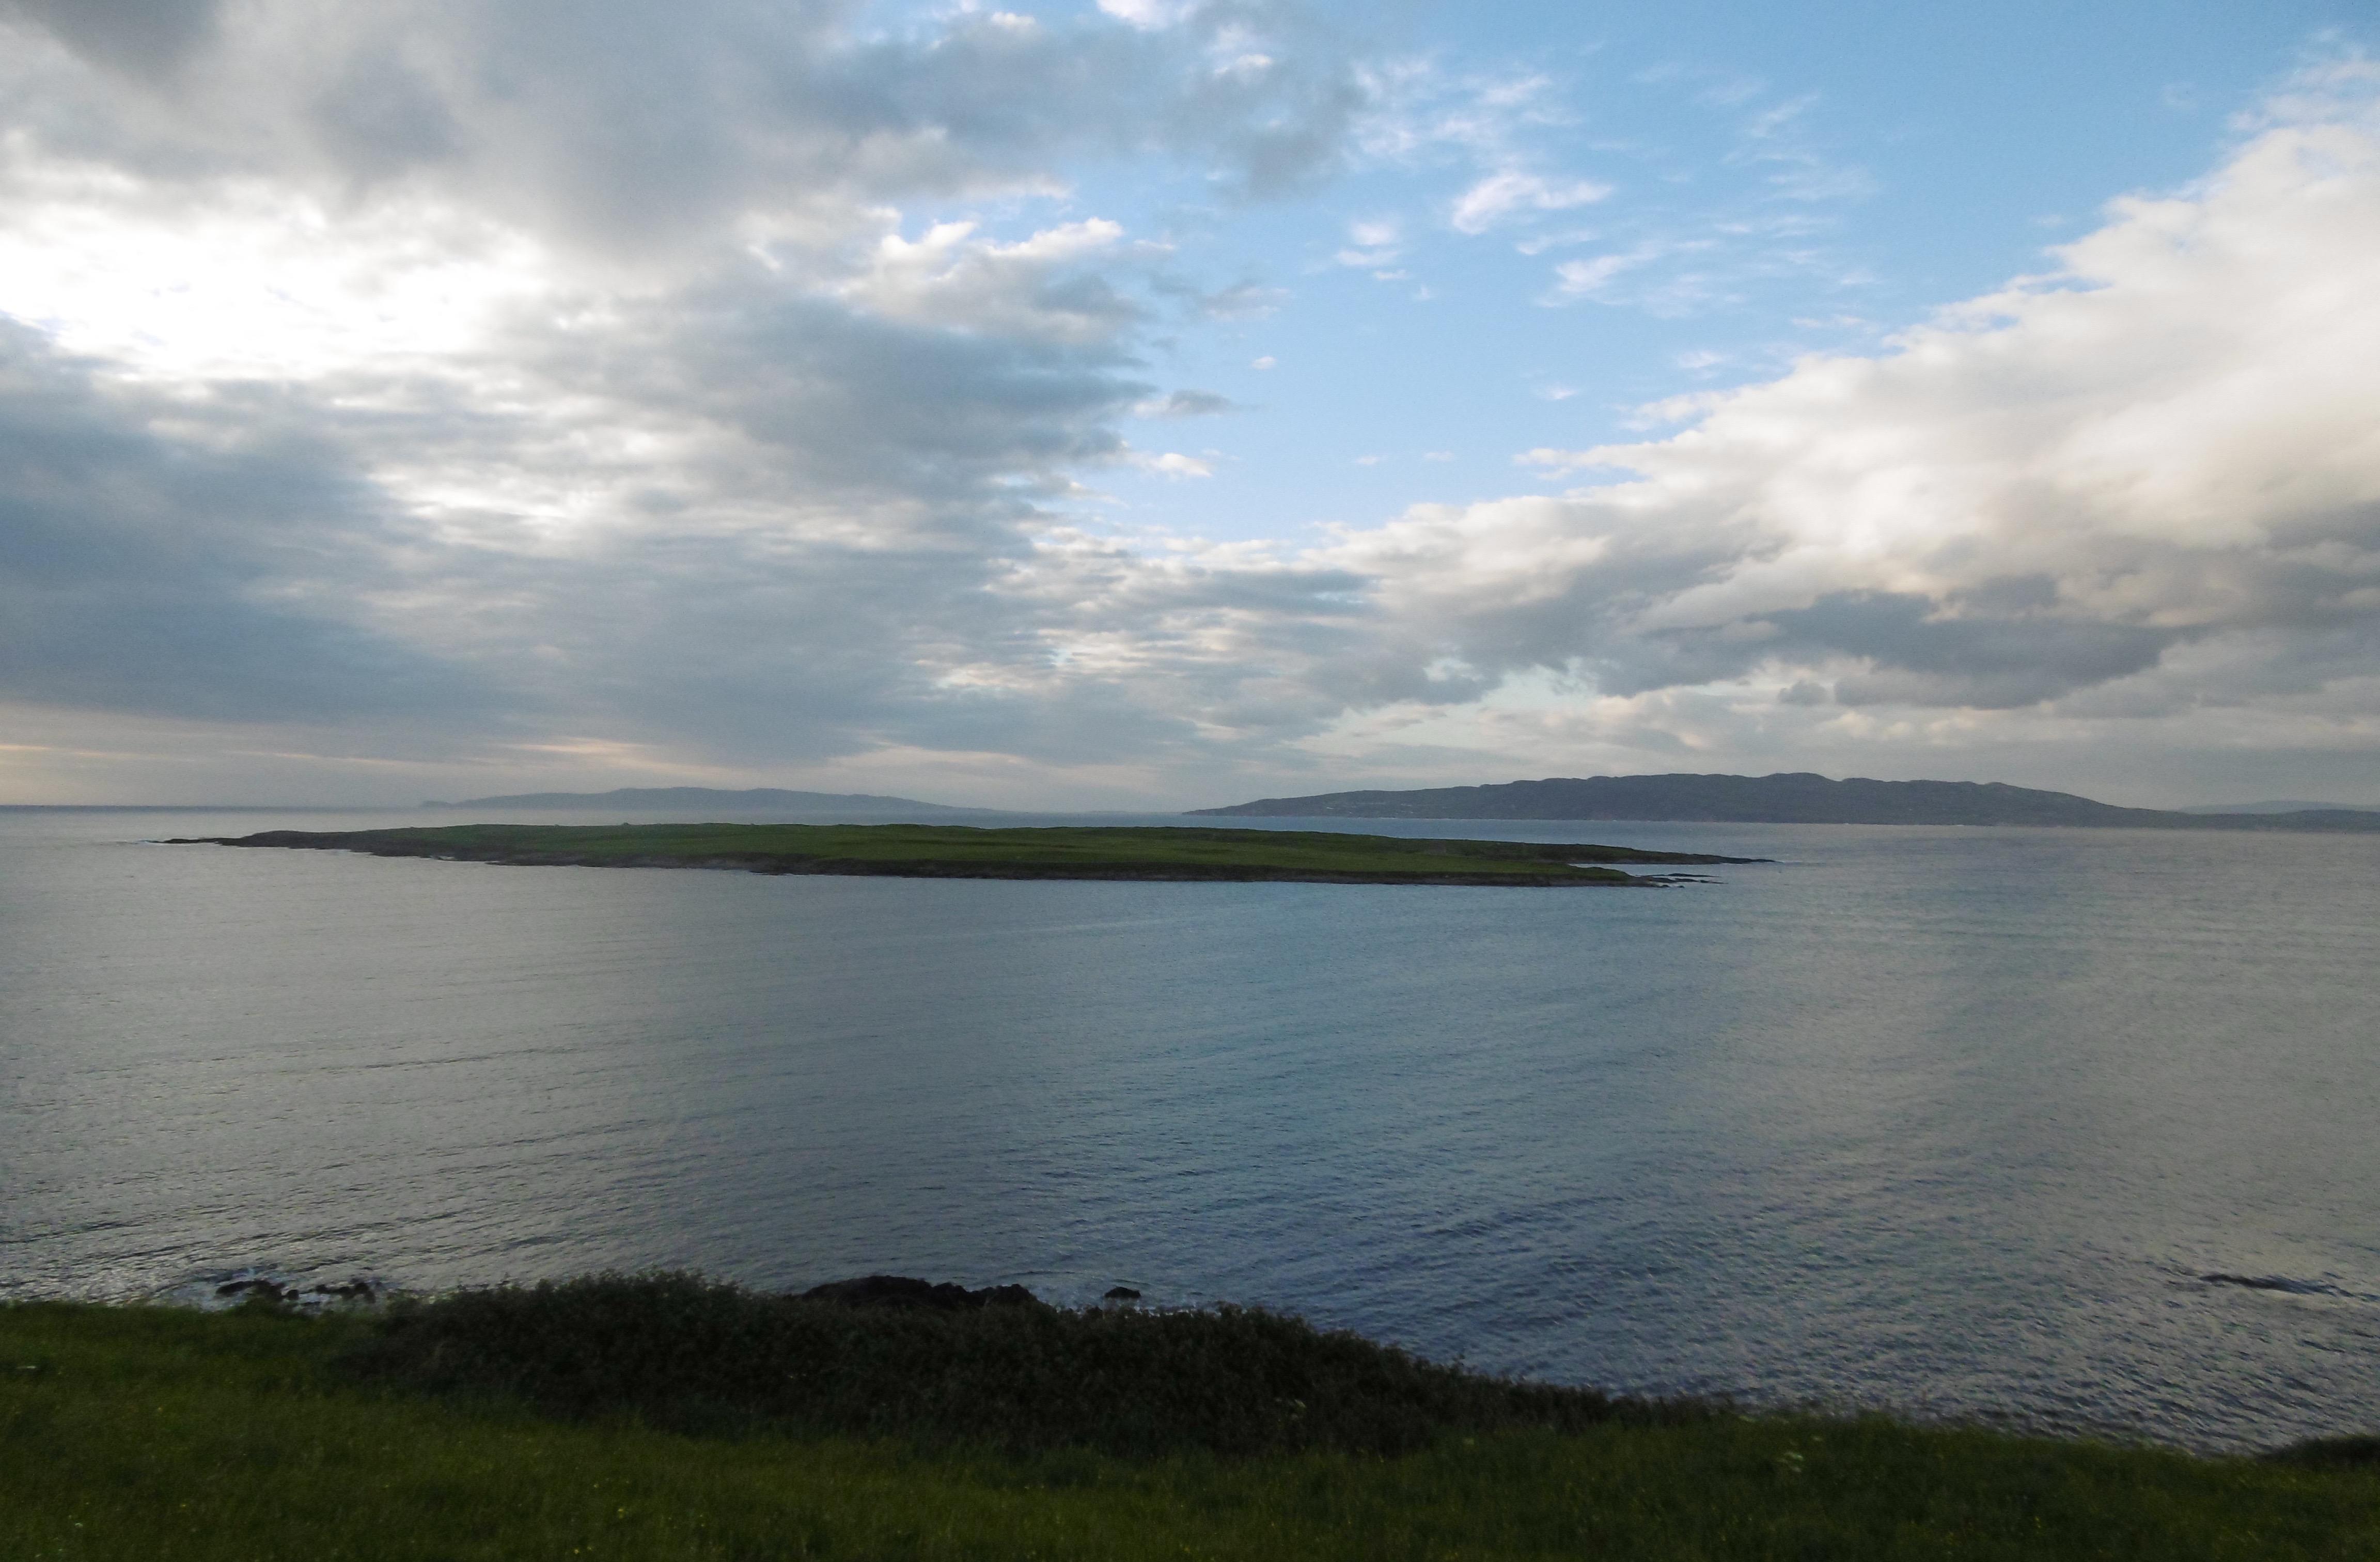 Inniskeel Island, Portnoo, Co. Donegal